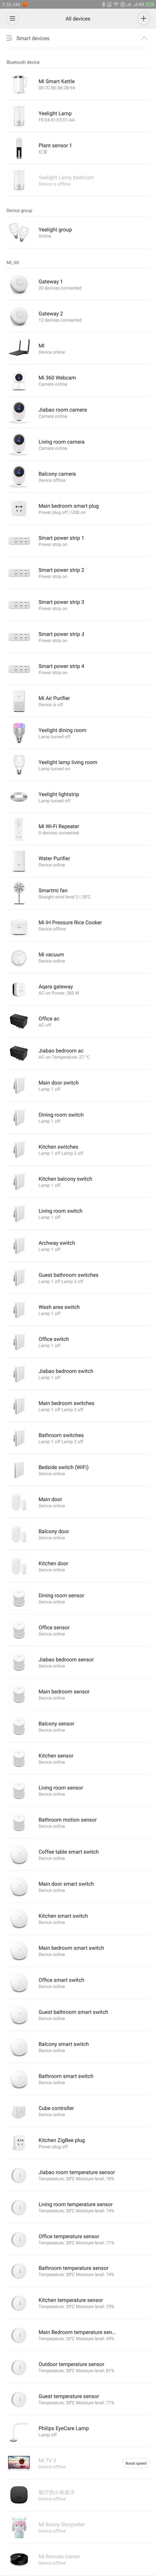 Xiaomi Mi Home device